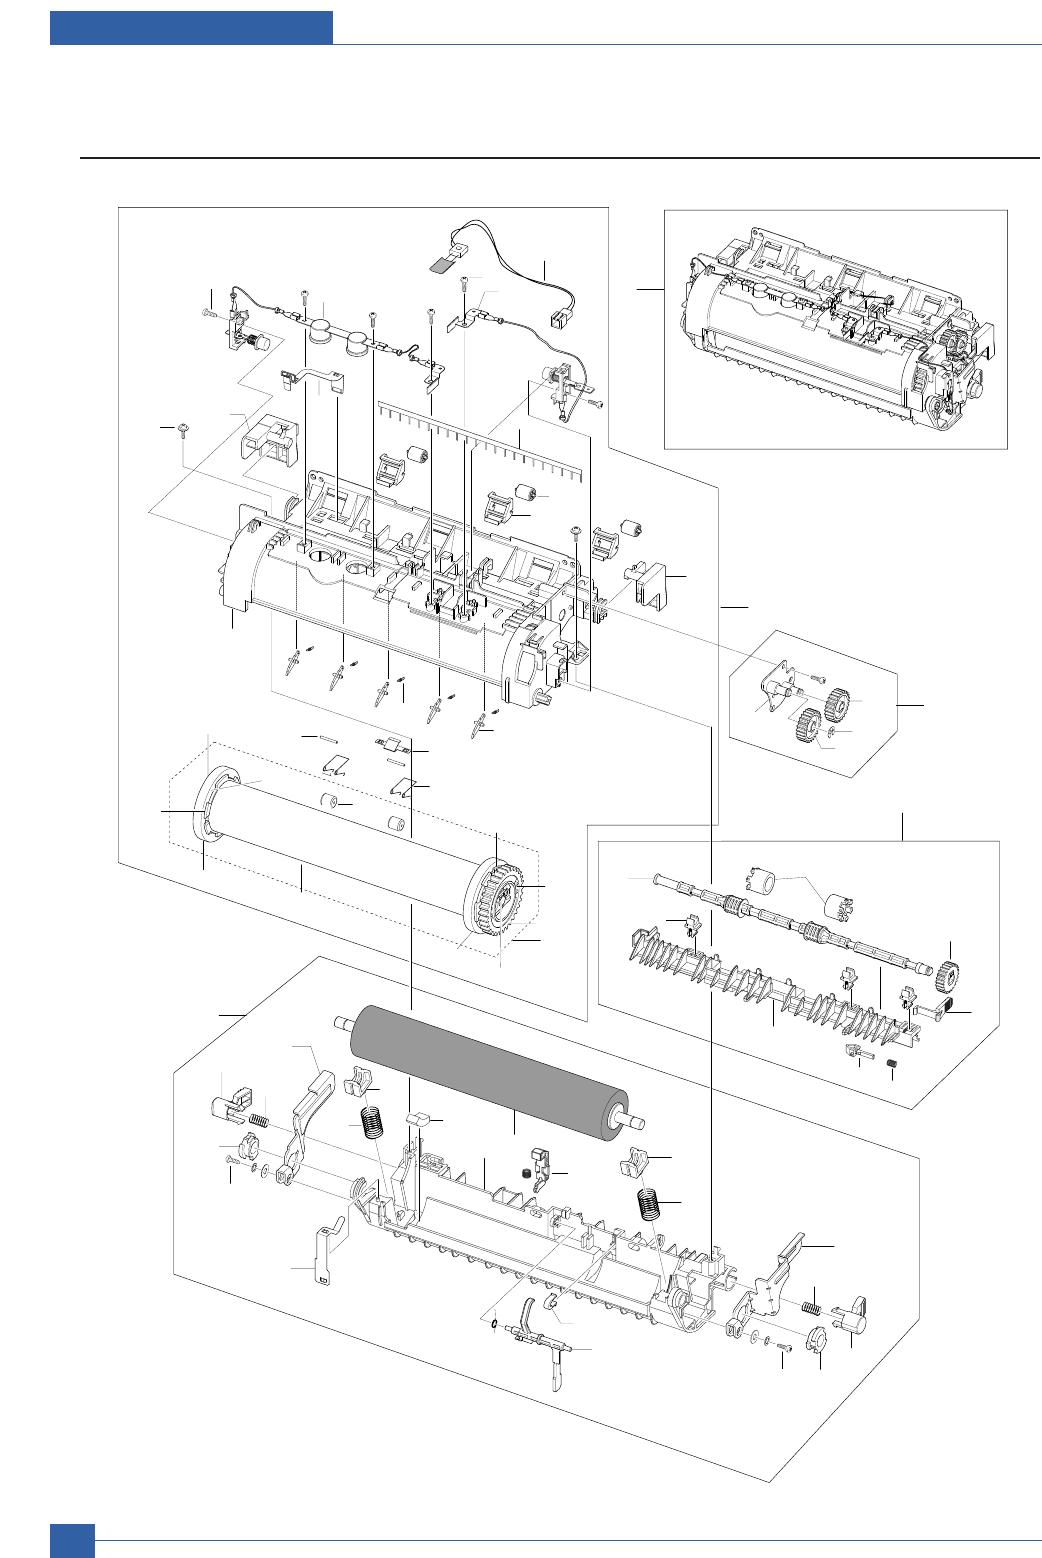 Samsung Printer Ml 4550 Users Manual